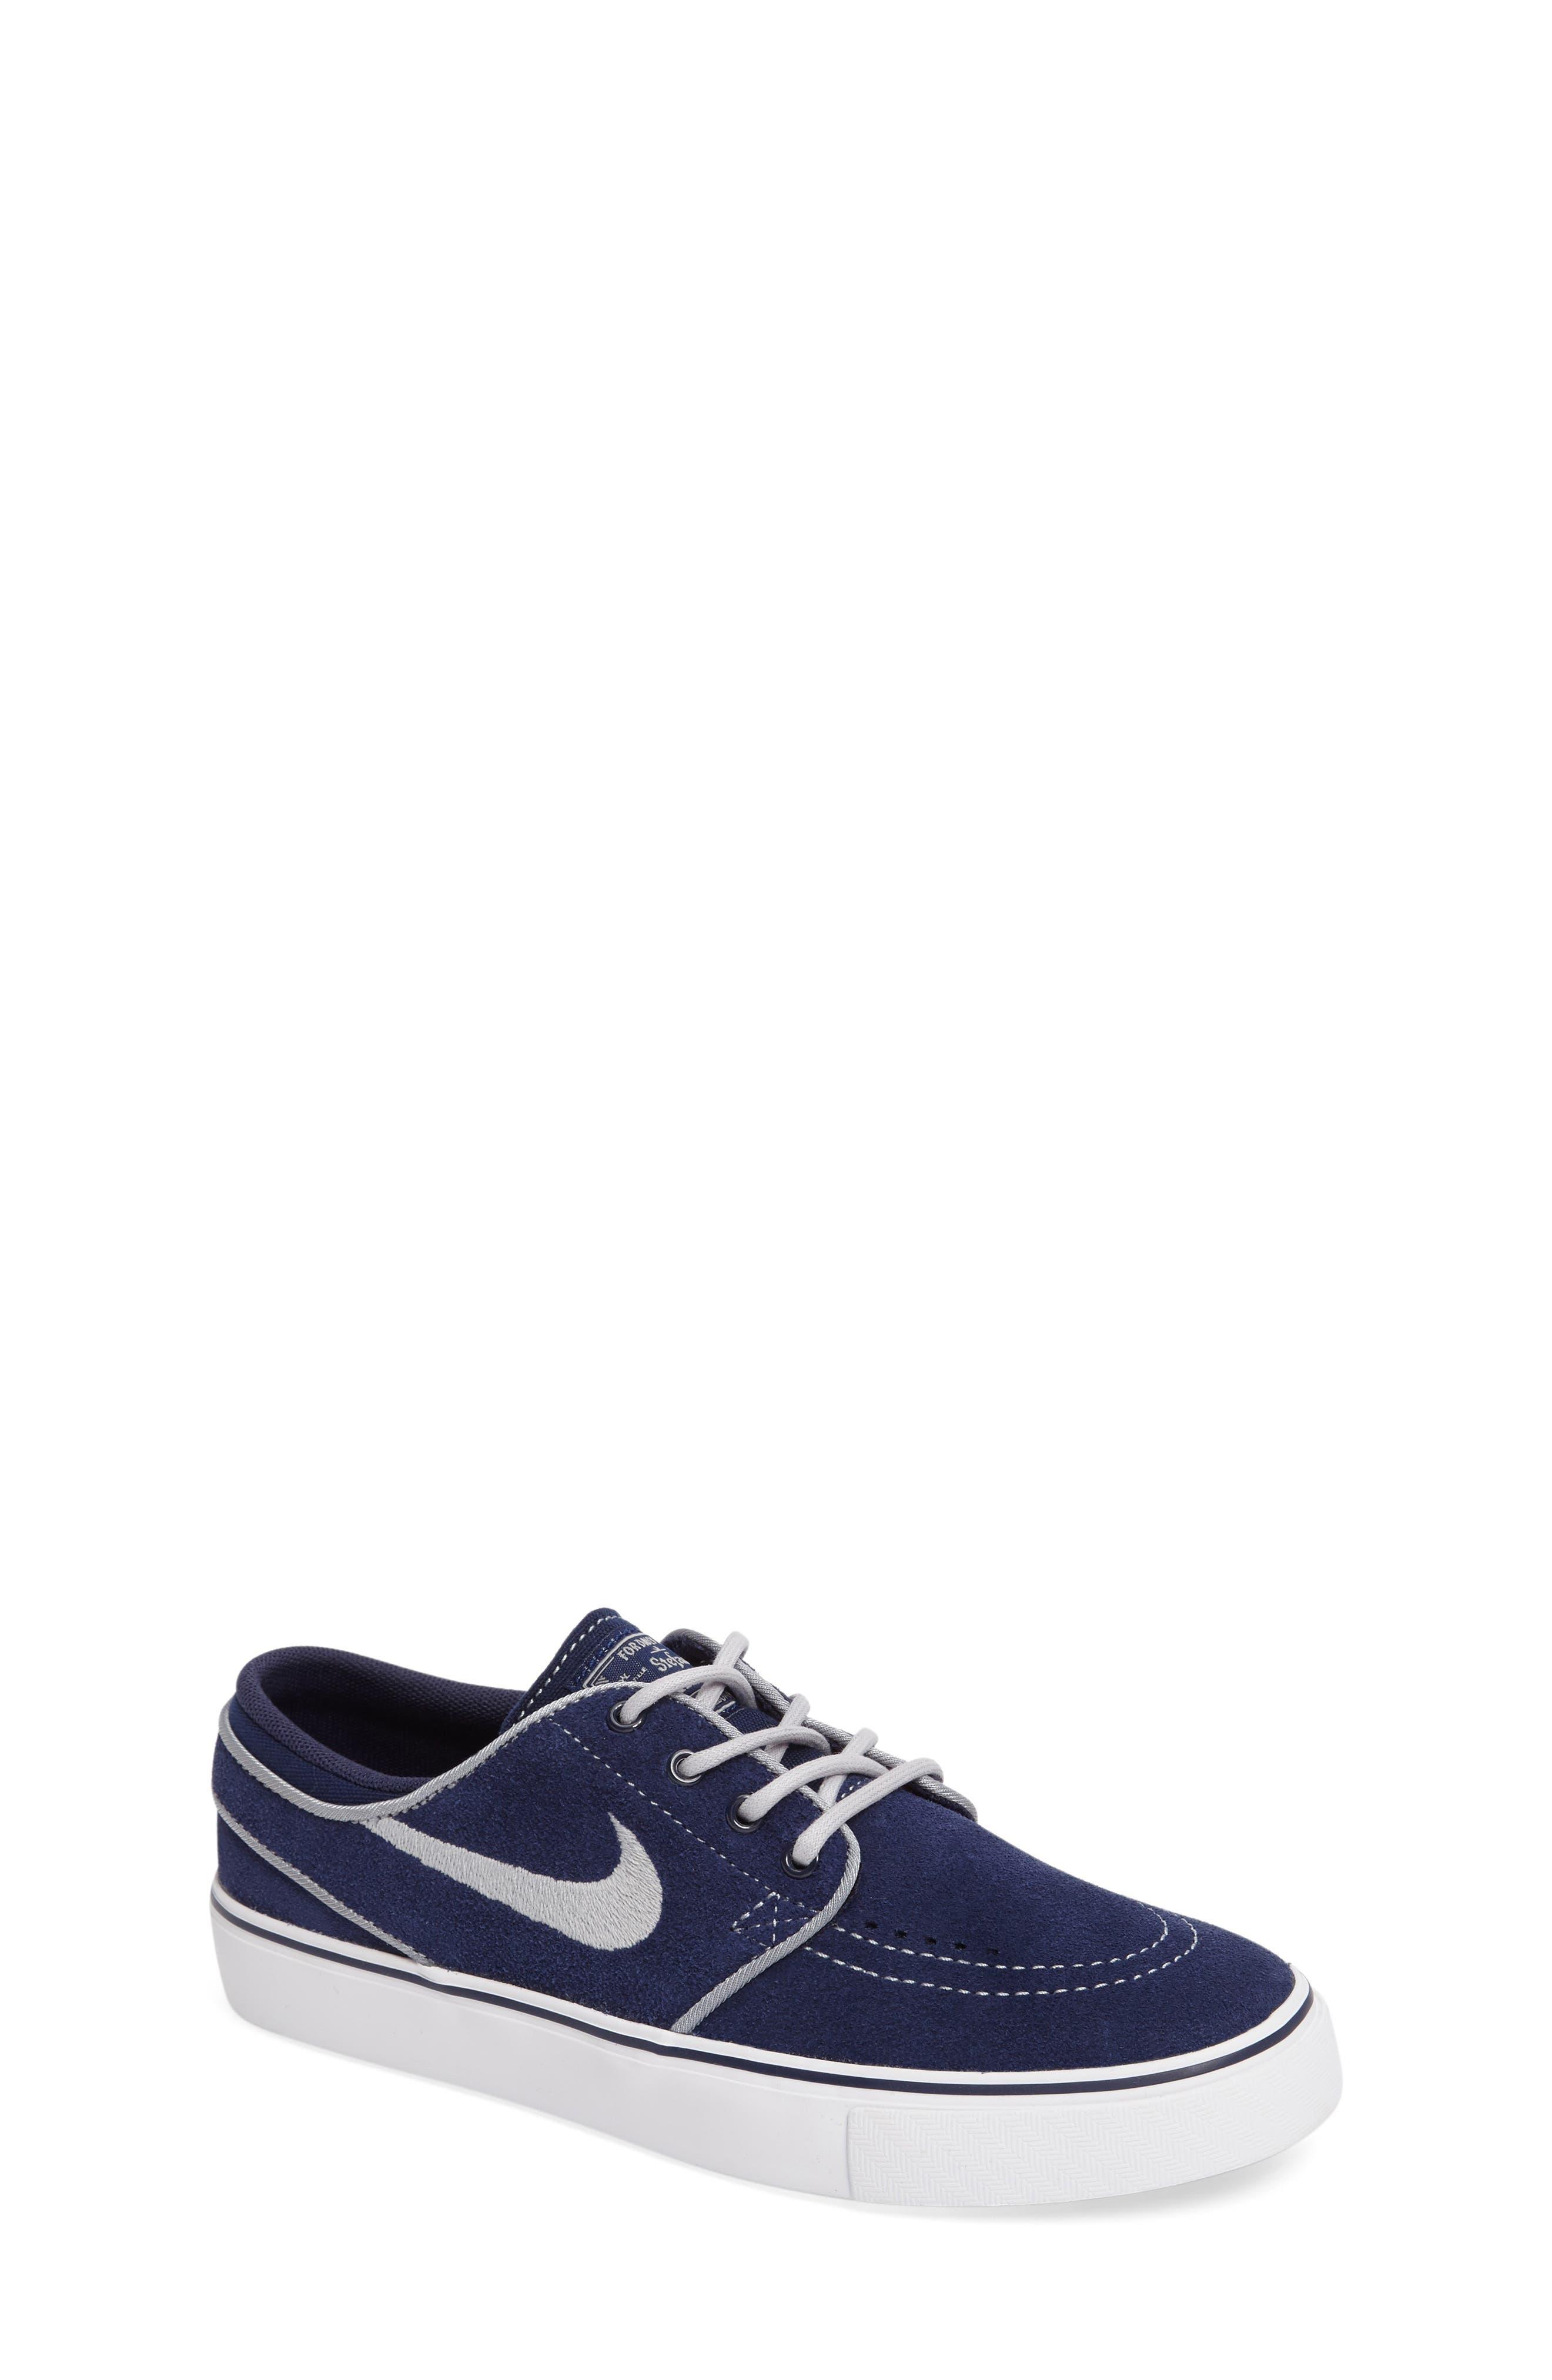 'Stefan Janoski' Sneaker,                             Main thumbnail 12, color,